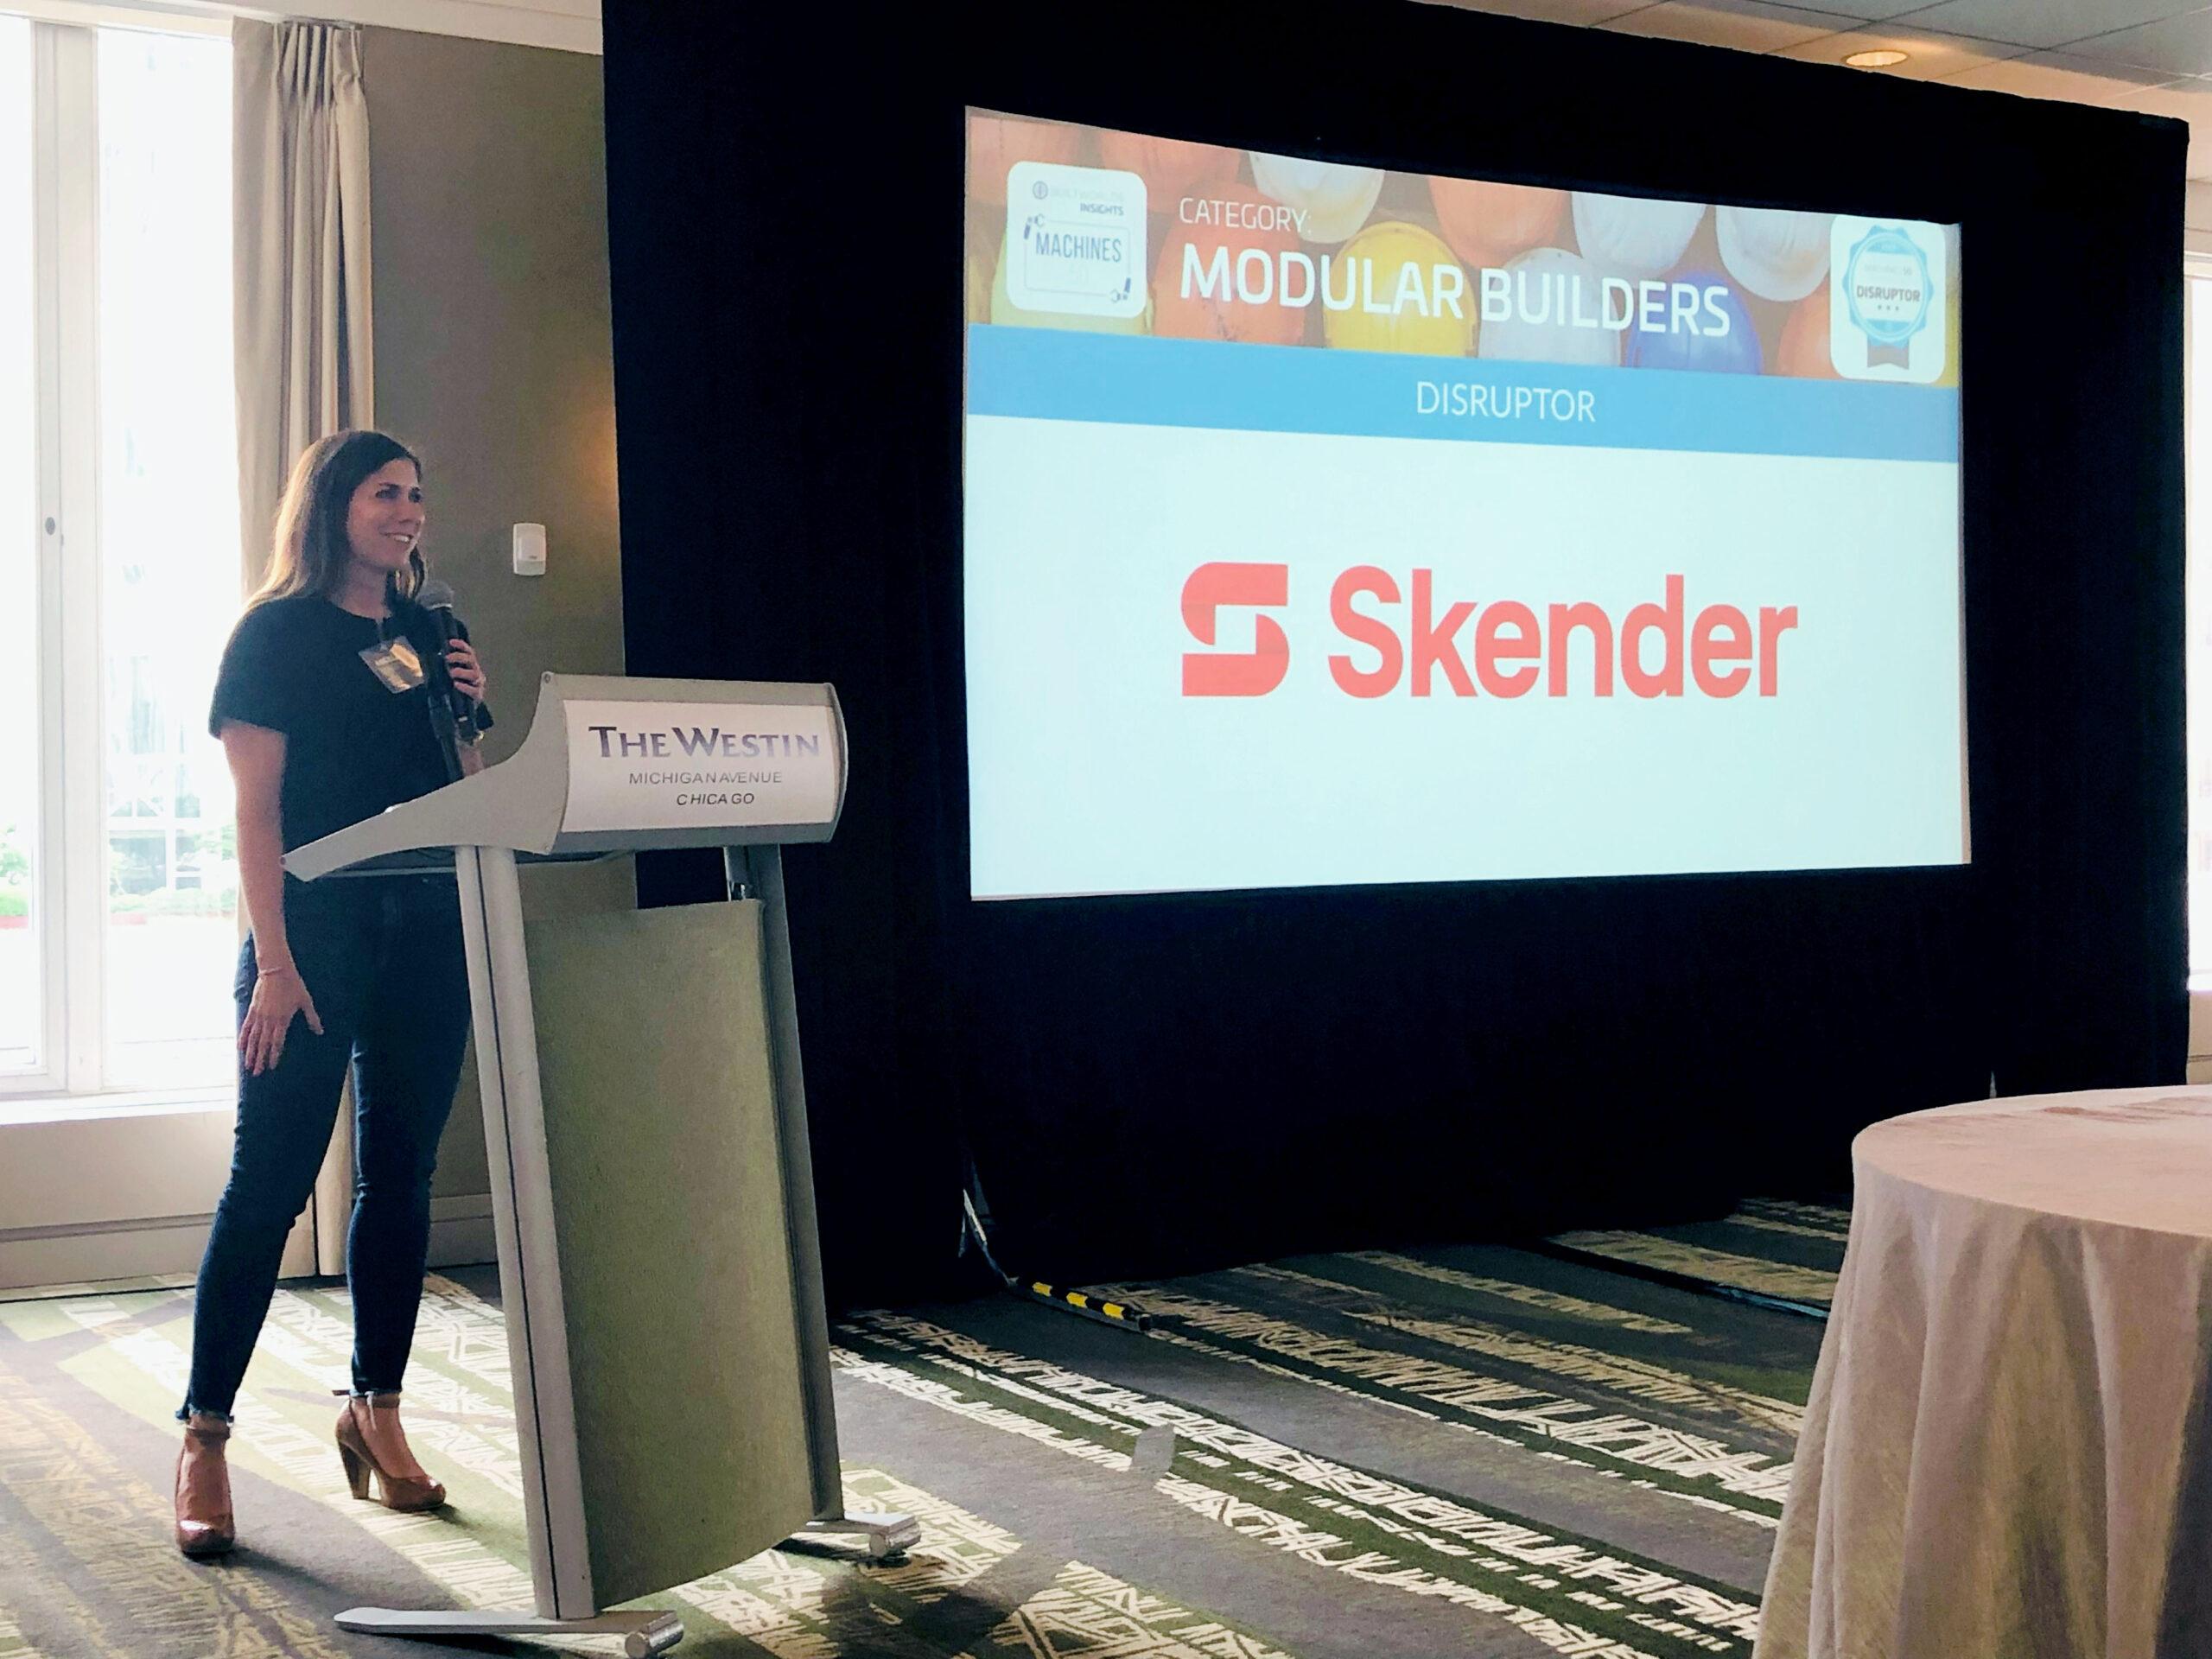 Skender Wins DISRUPTOR Award at BuiltWorlds' Machines Conference